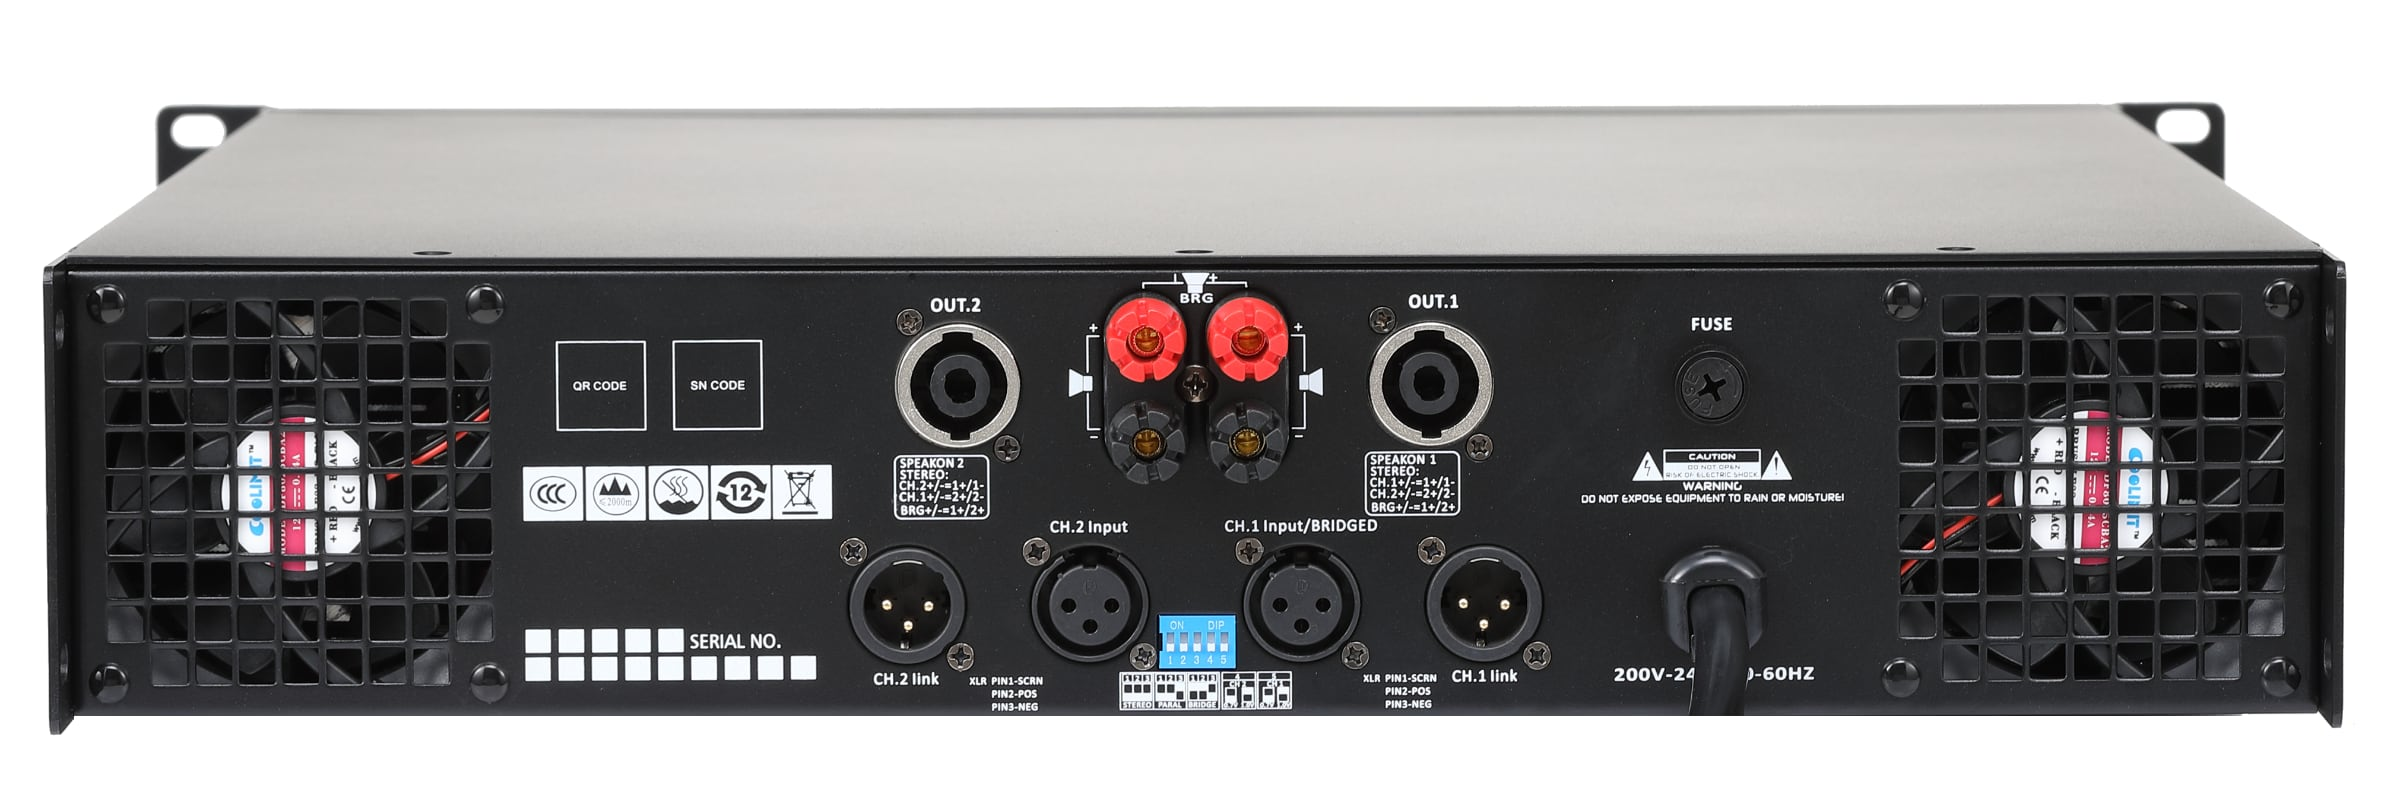 Công suất AAP SU-2800